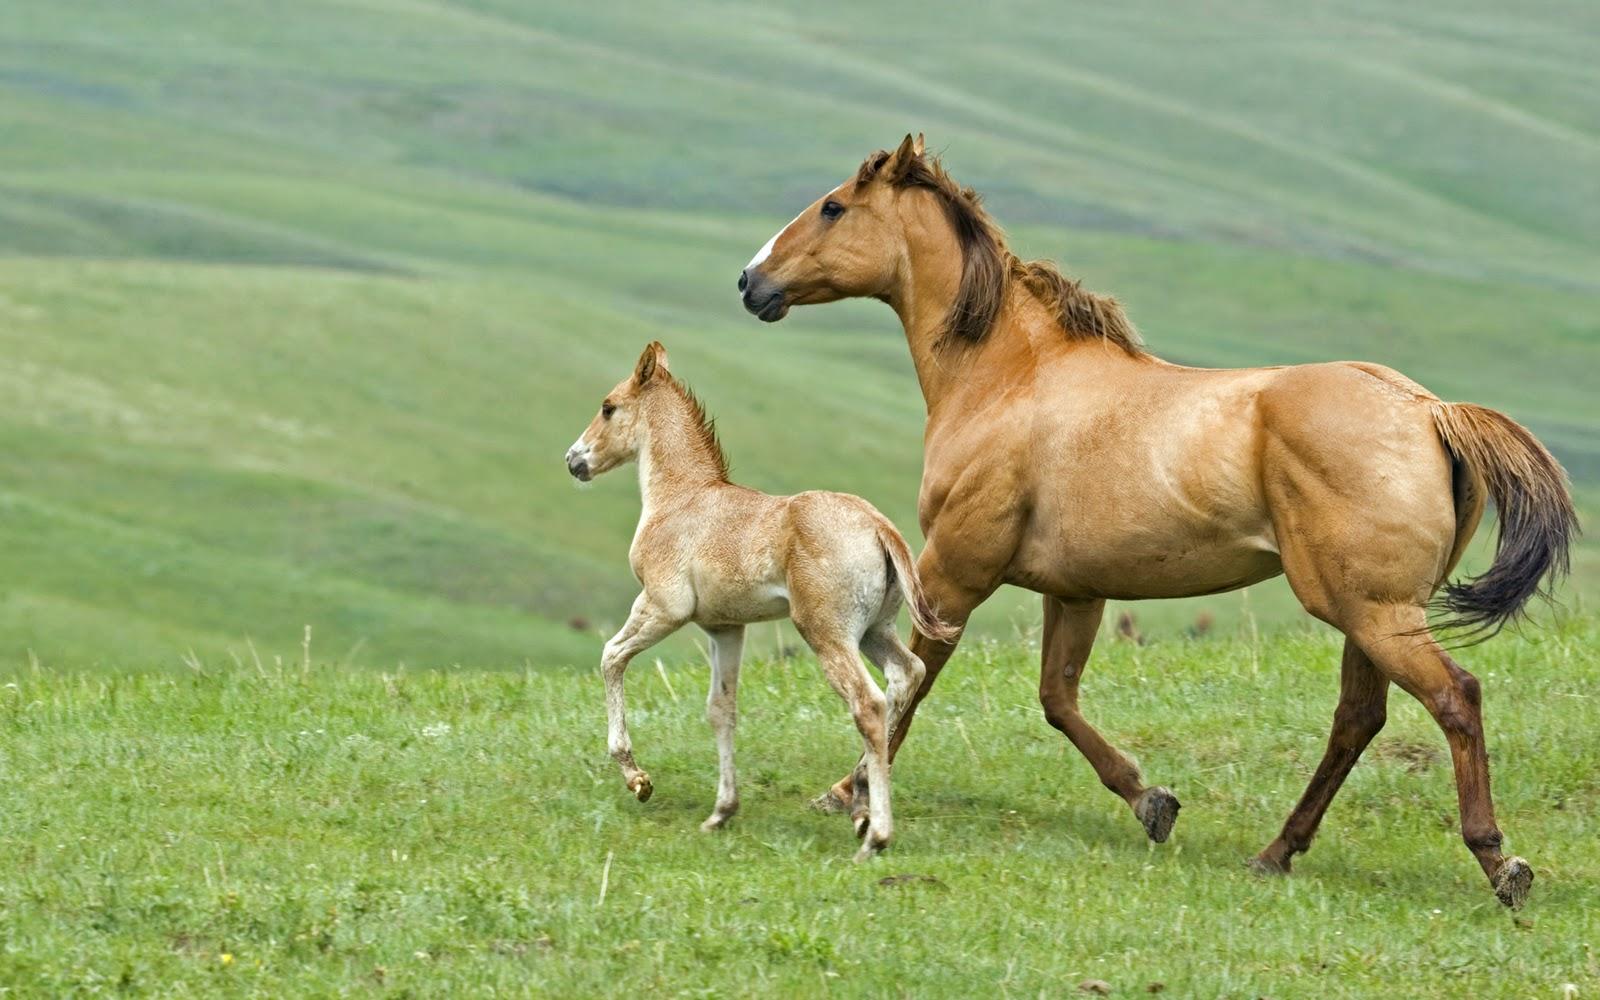 Simple   Wallpaper Horse Flicka - Horses+Wallpapers+1920x1200-1  Pictures_488160.jpg